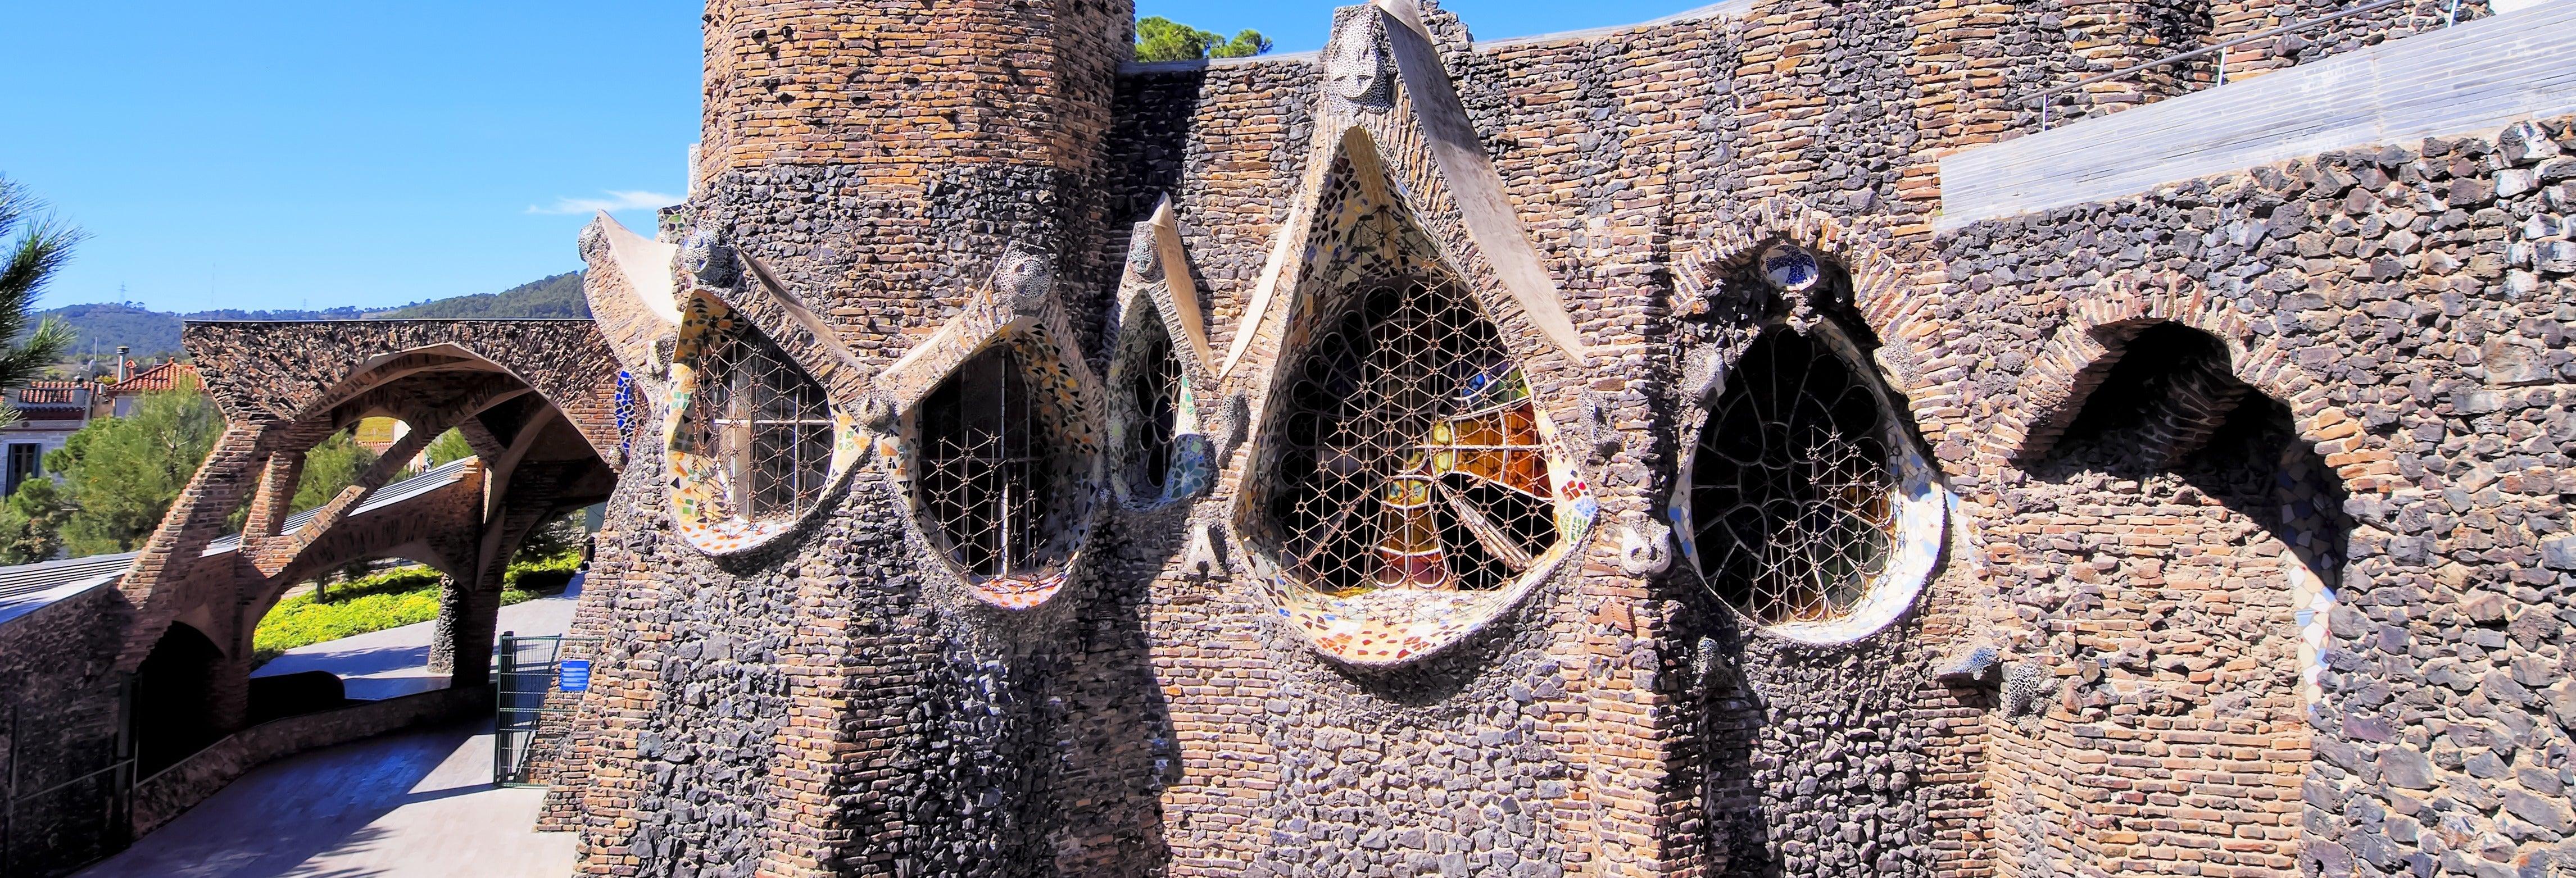 Tour pela Colónia Güell e Cripta de Gaudí